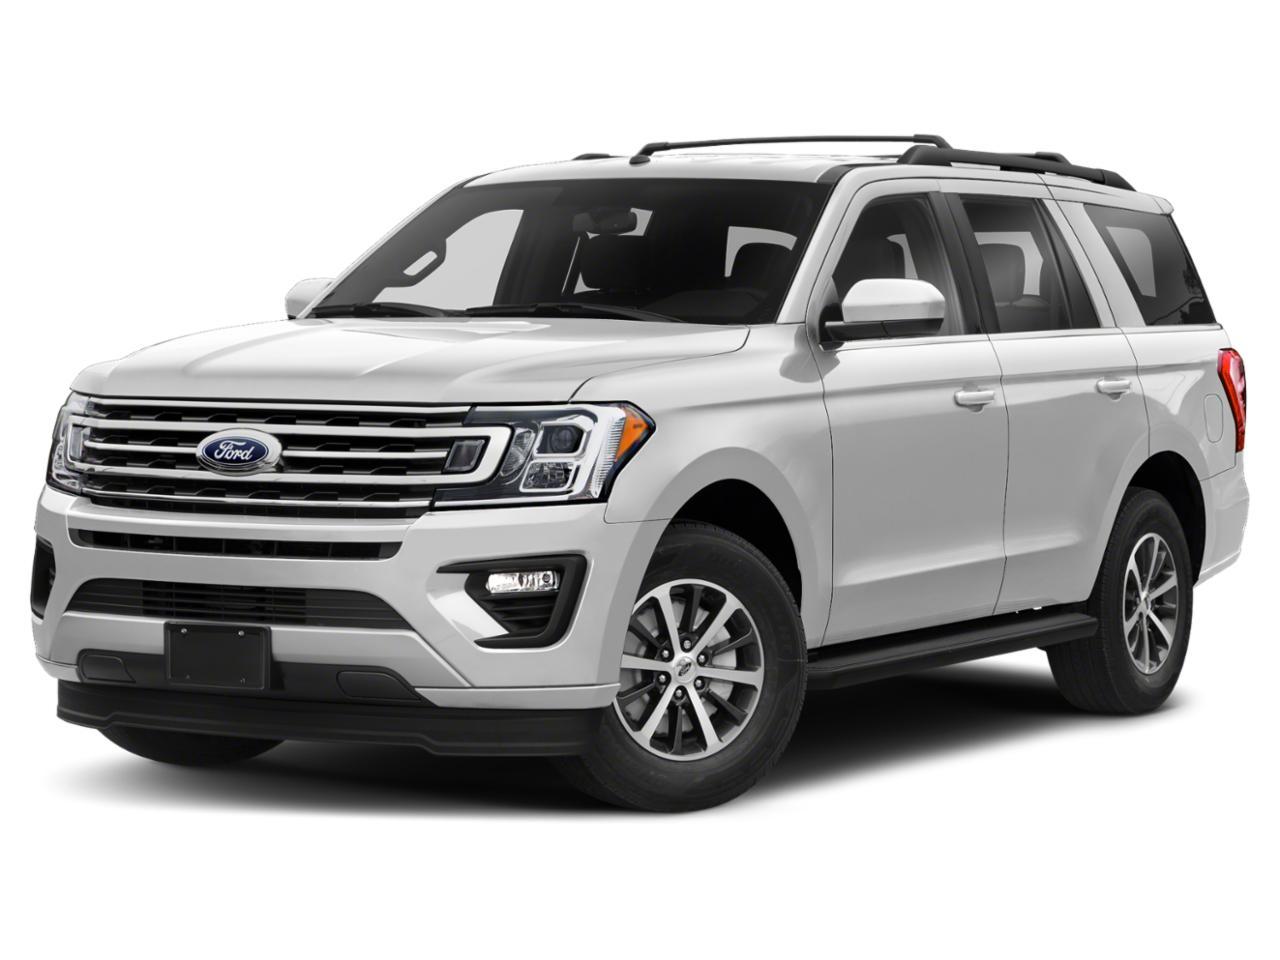 2020 Ford Expedition XLT 4x4 XLT 4dr SUV Slide